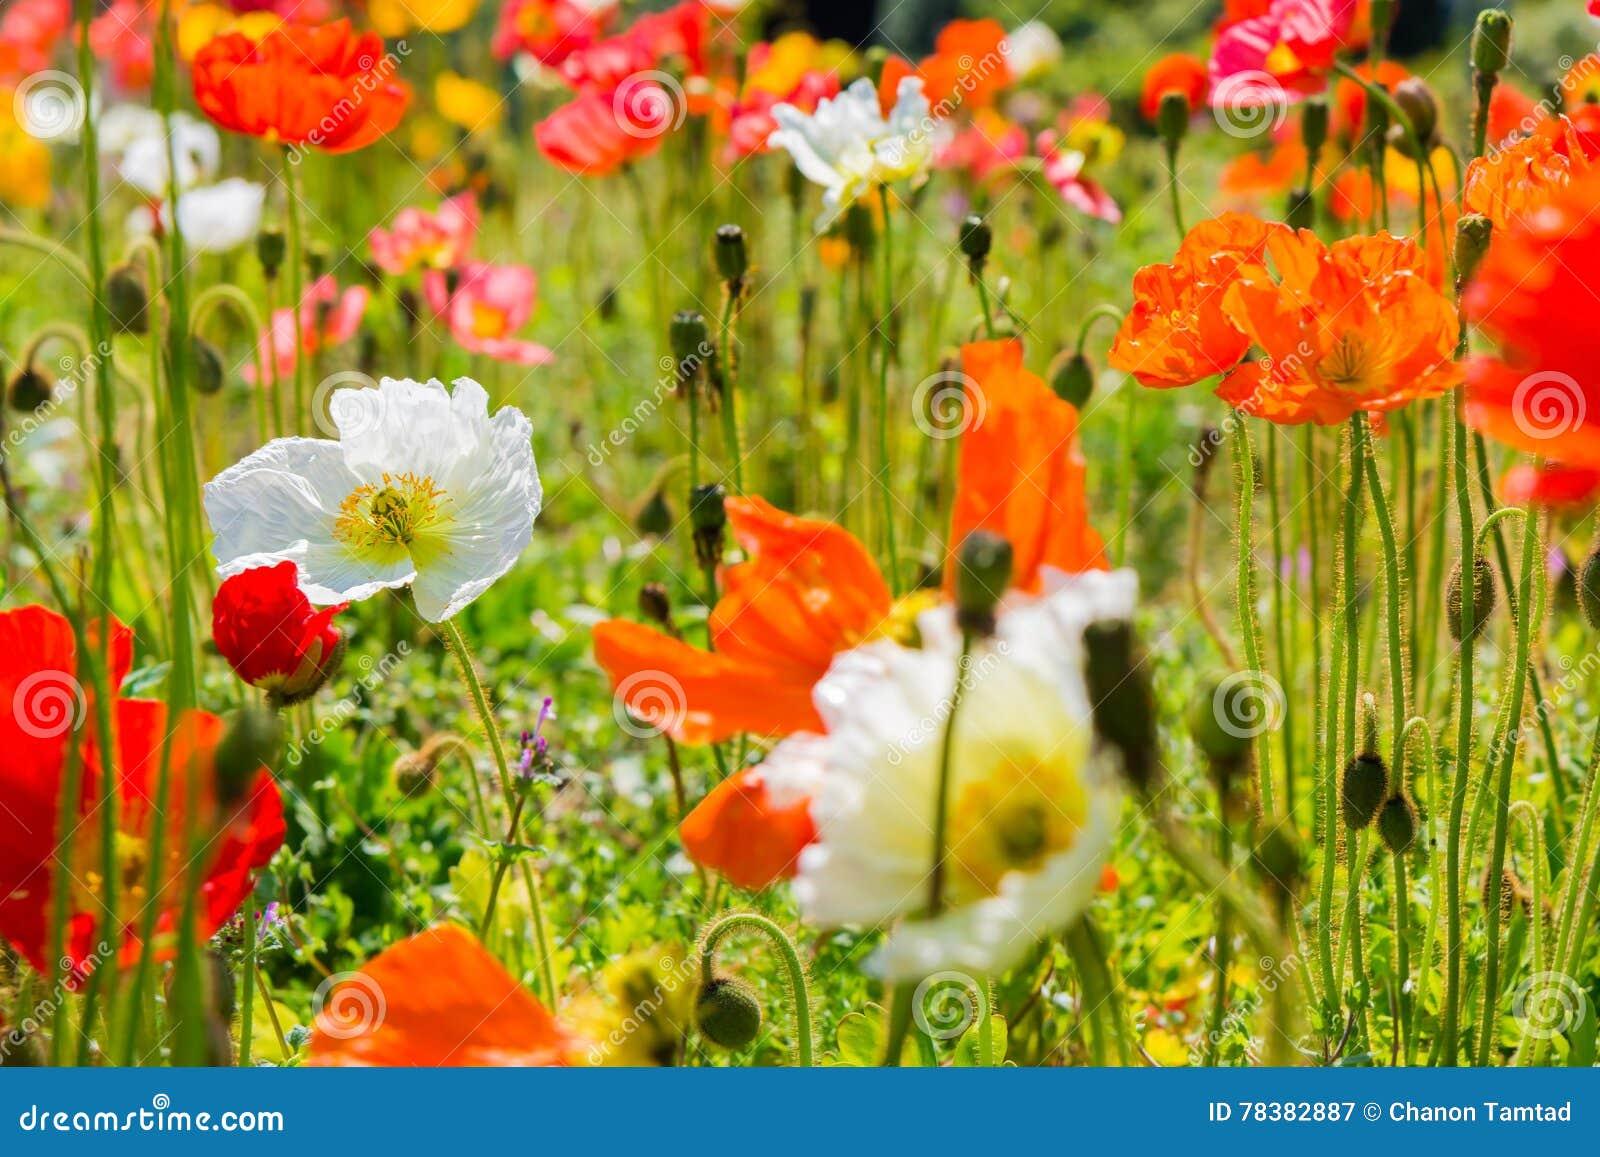 Beautiful Flower Garden Of A Iceland Poppy Flower Stock Image